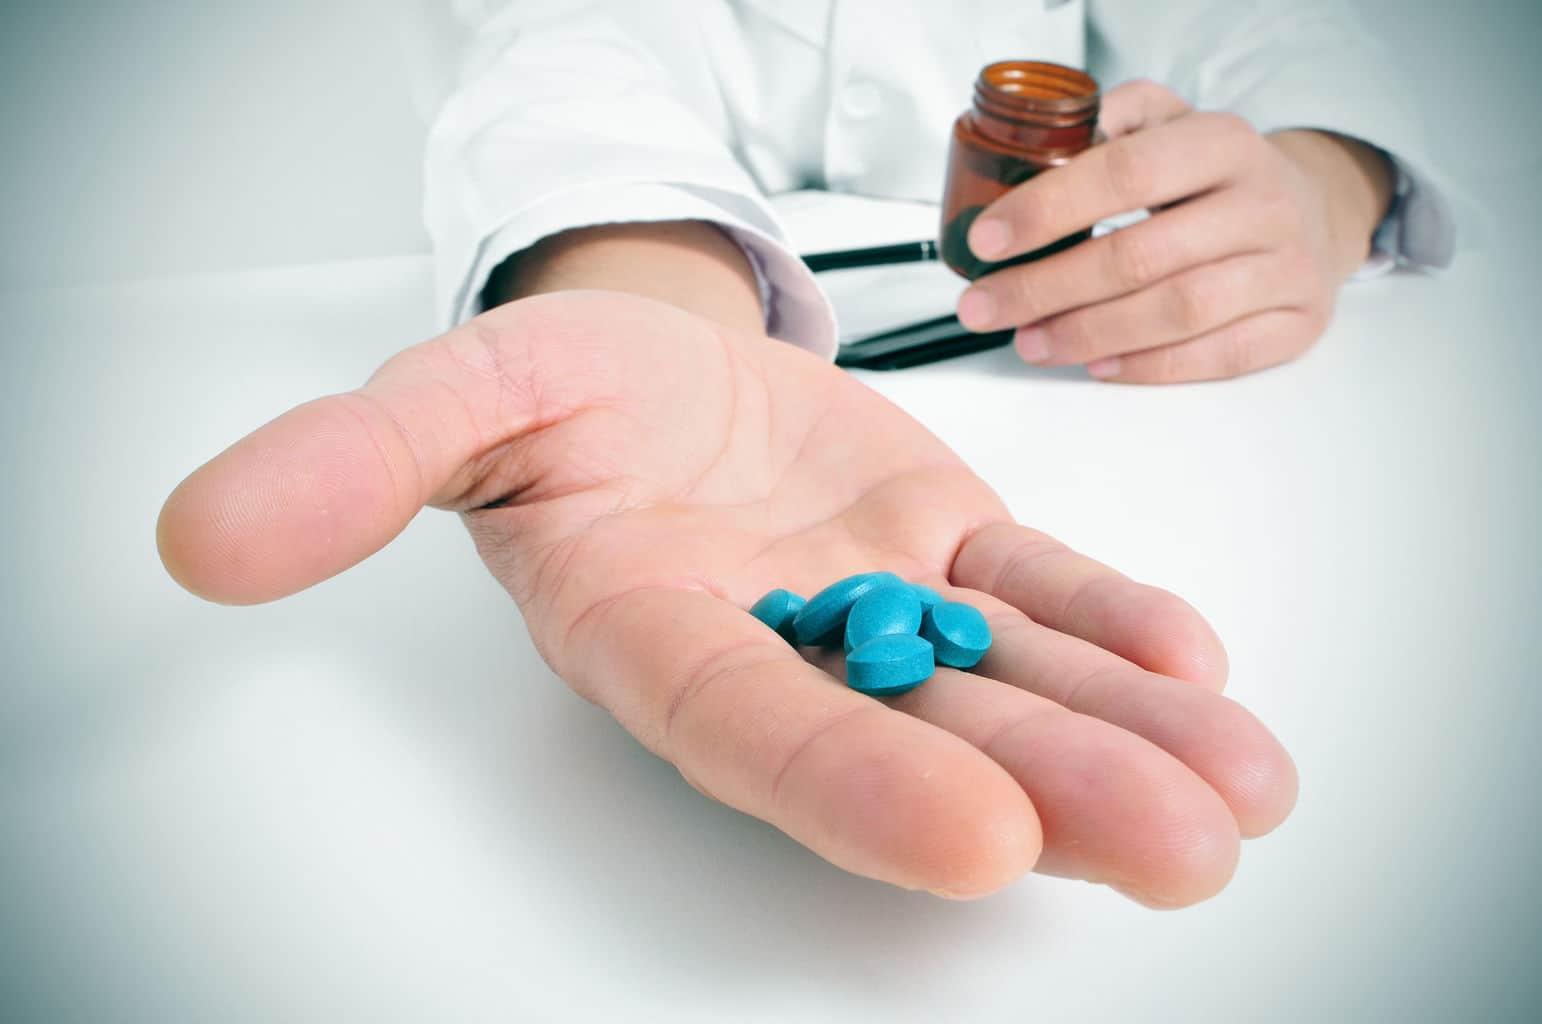 Viagra causes desensitization in men